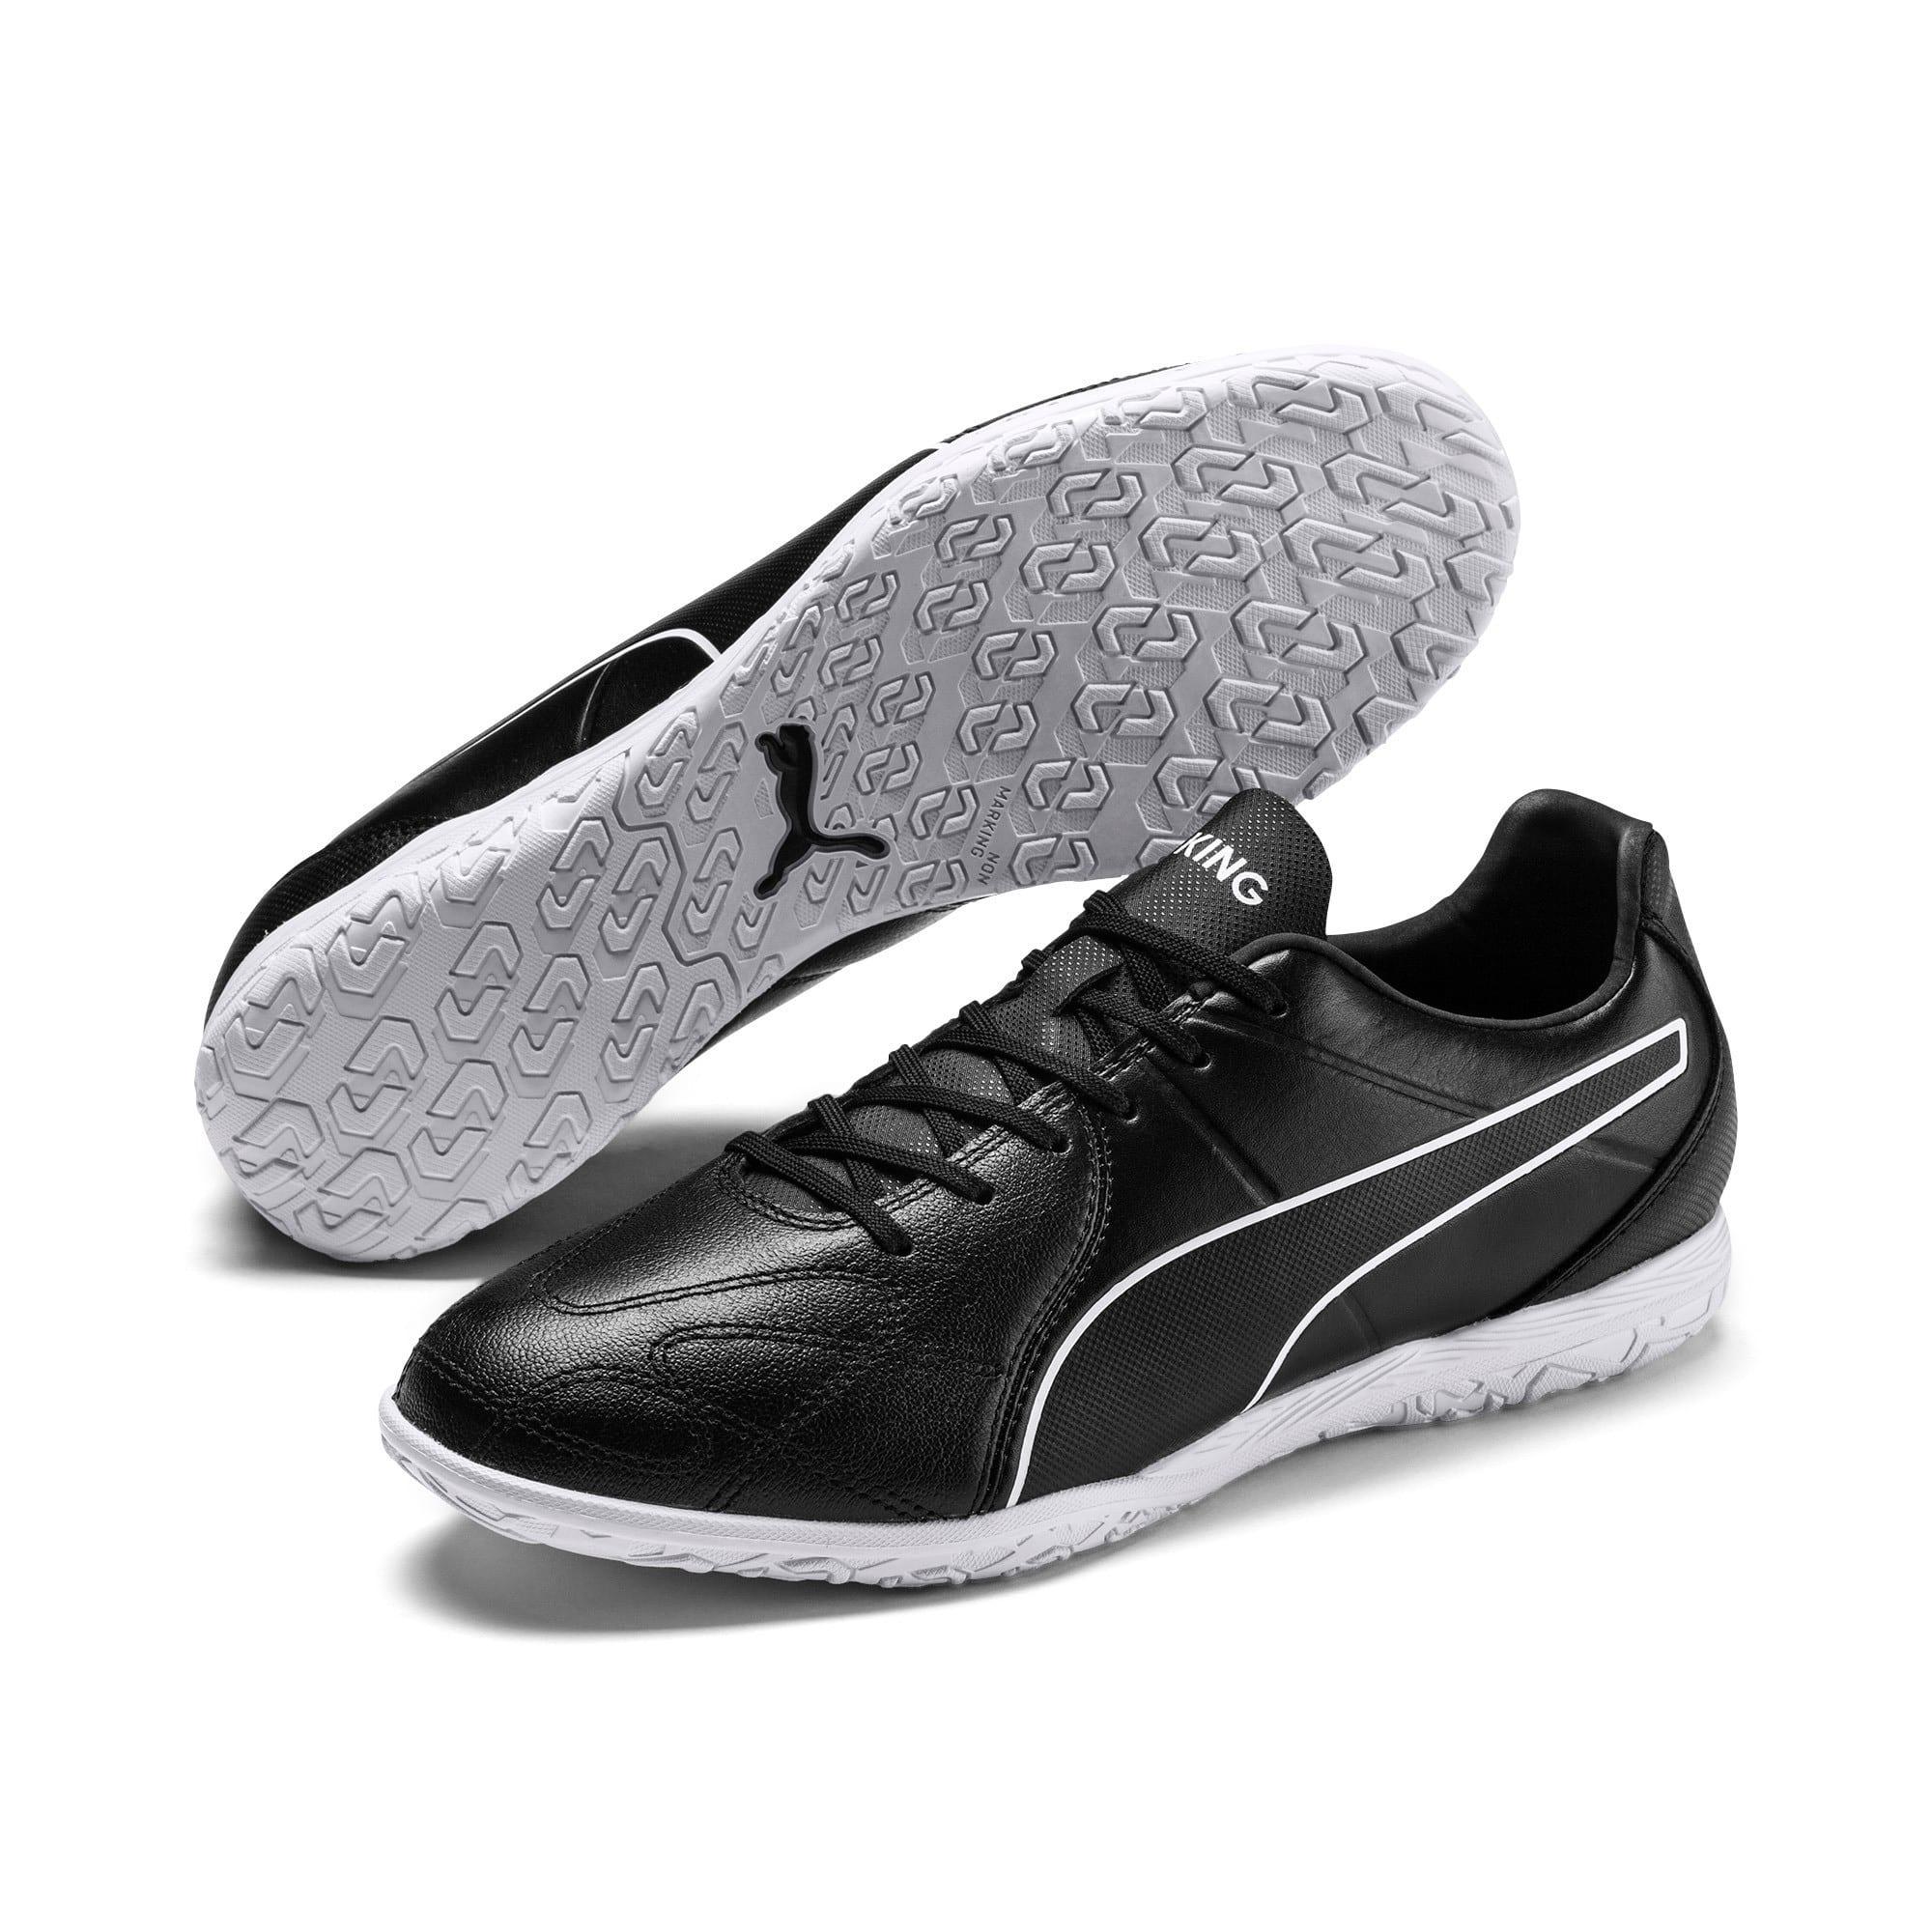 Thumbnail 3 of KING Hero IT Football Boots, Puma Black-Puma White, medium